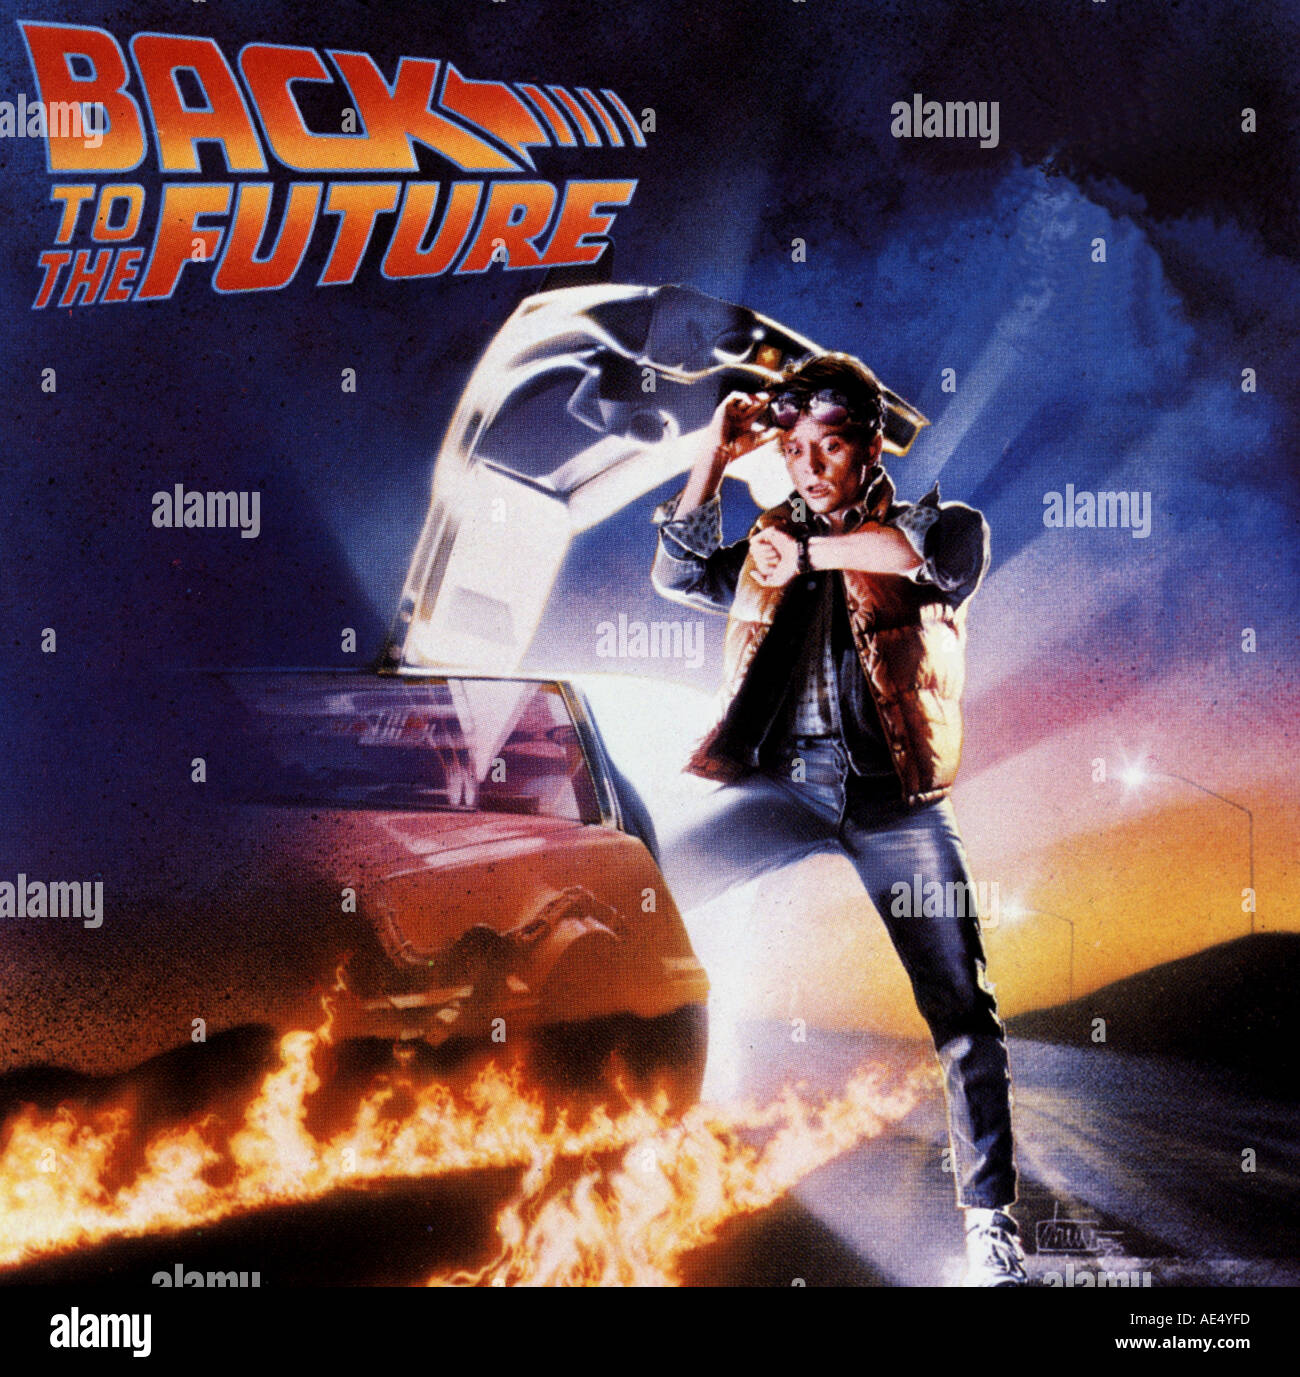 BACK TO THE FUTURE-Plakat von dem 1985 Film mit Michael J Fox Stockbild